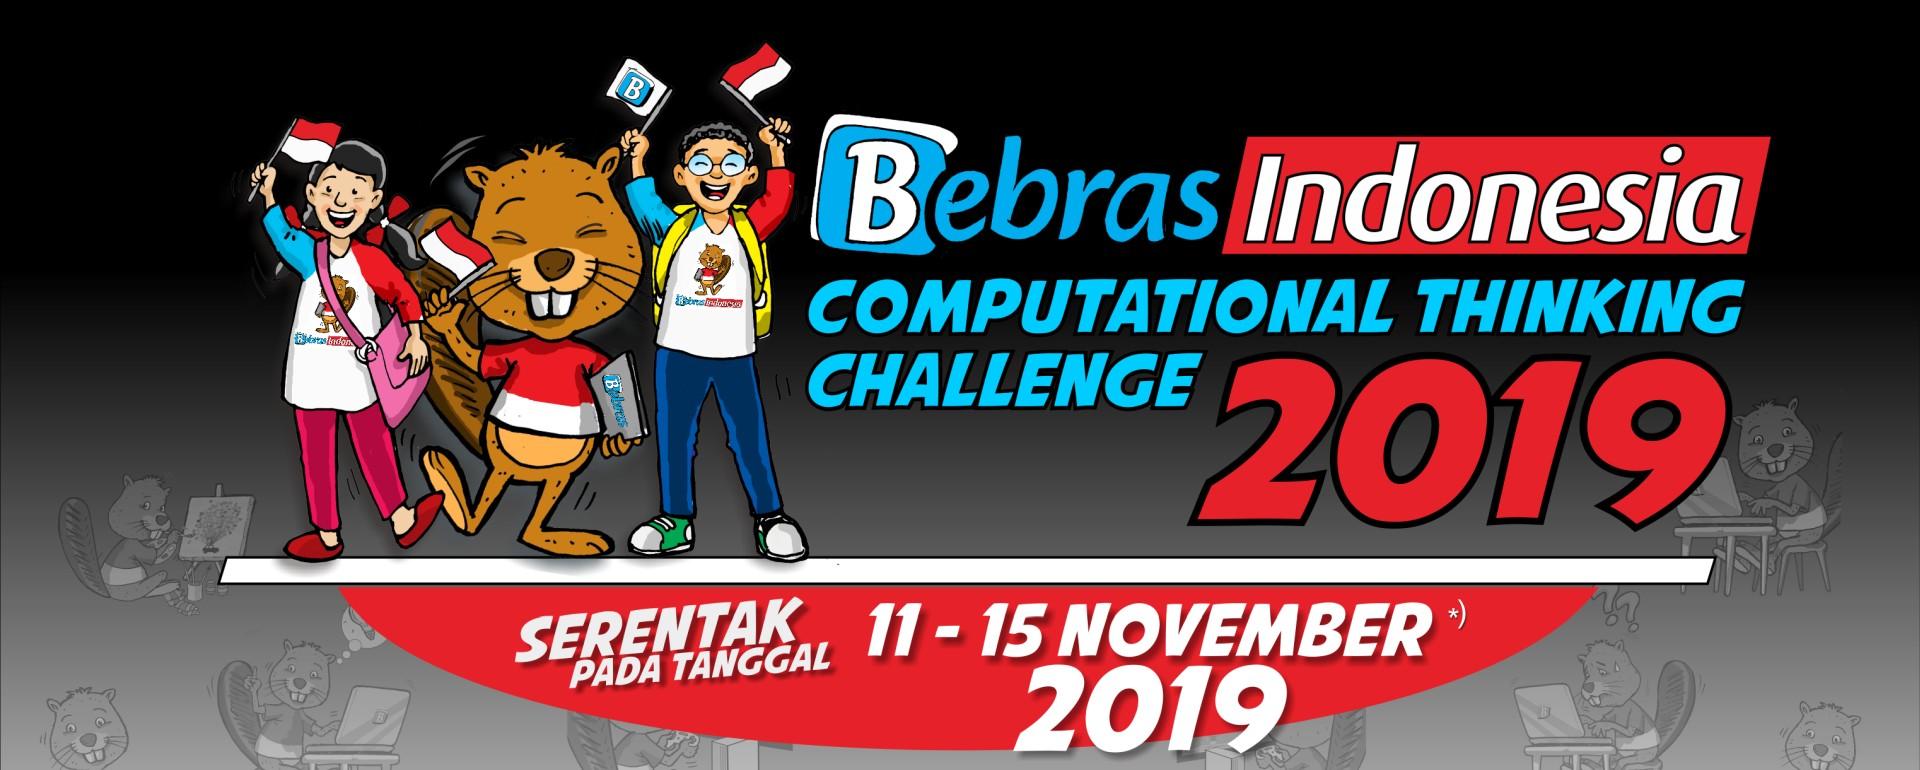 Situs Resmi Bebras Indonesia Computational Thinking